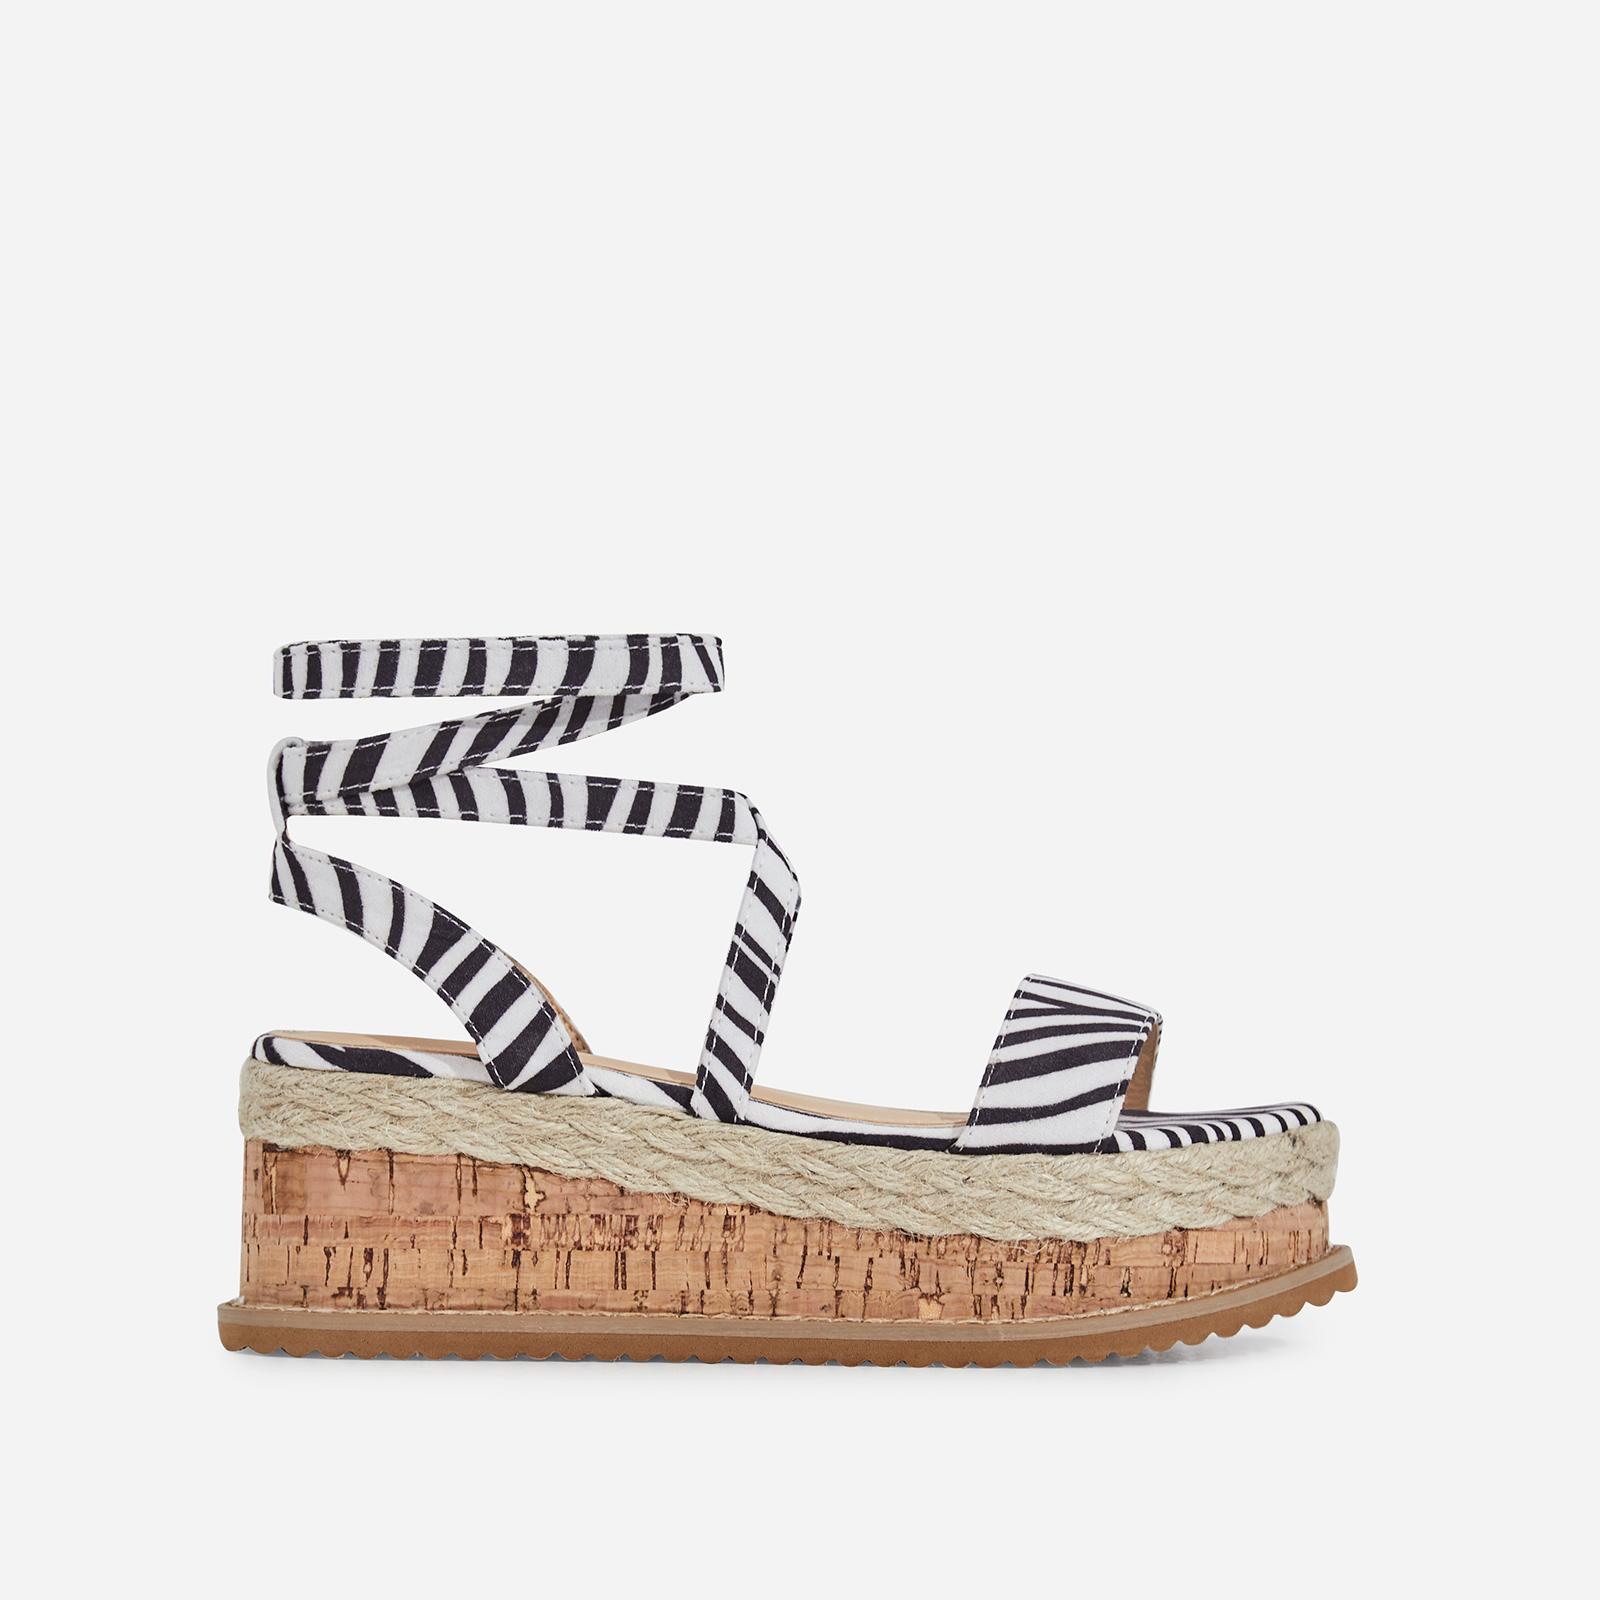 Abigail Strappy Espadrille Flatform In Zebra Print Faux Suede